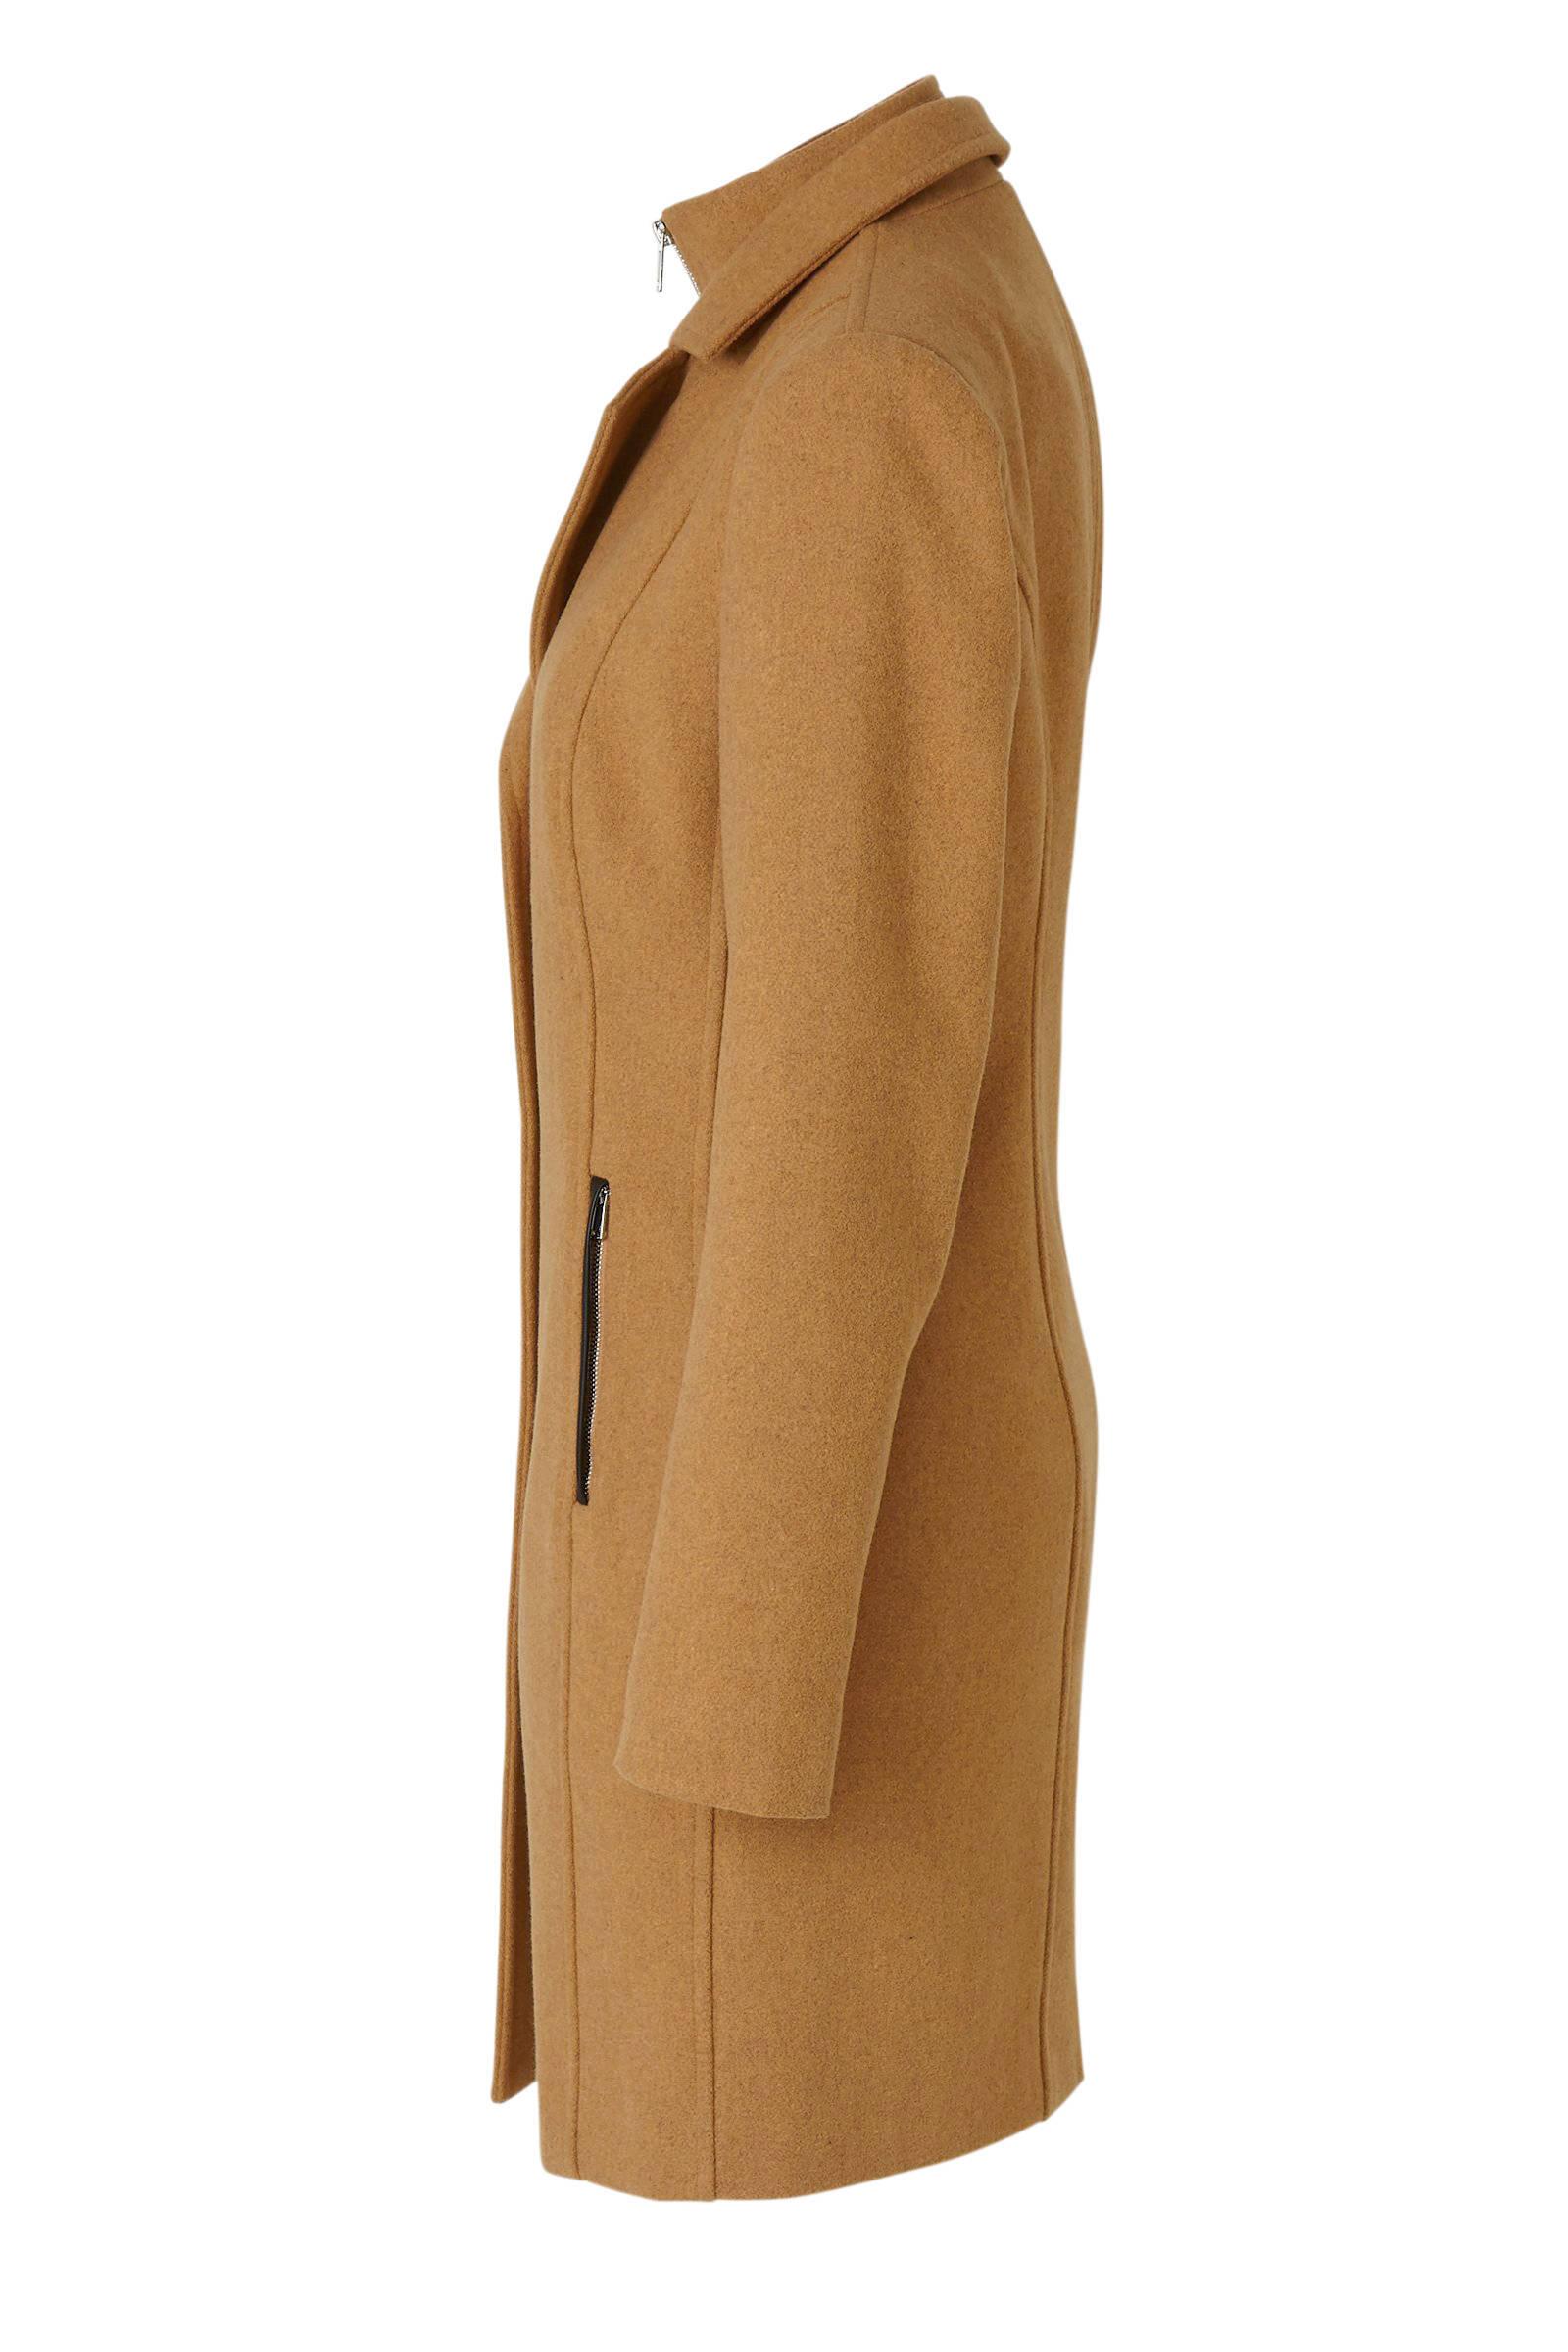 anytime coat met wol camel   wehkamp